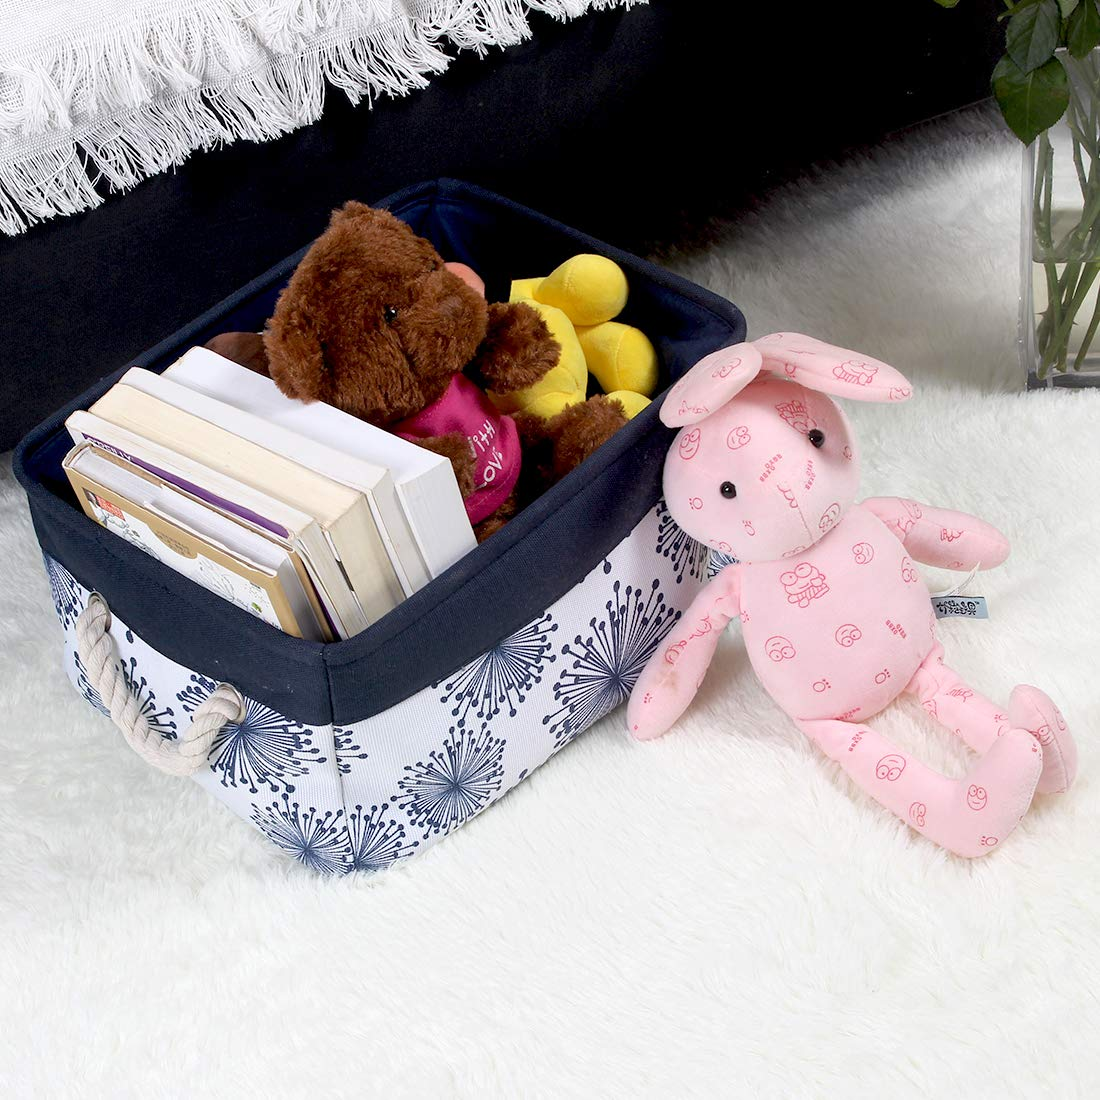 Medium - 14.2 x 10.2 x 6.7 BEYONDY Storage Bins,Fabric Storage Baskets Towel Storage Bin Laundry Toy Basket w Drawstring Closure, Dinosaur